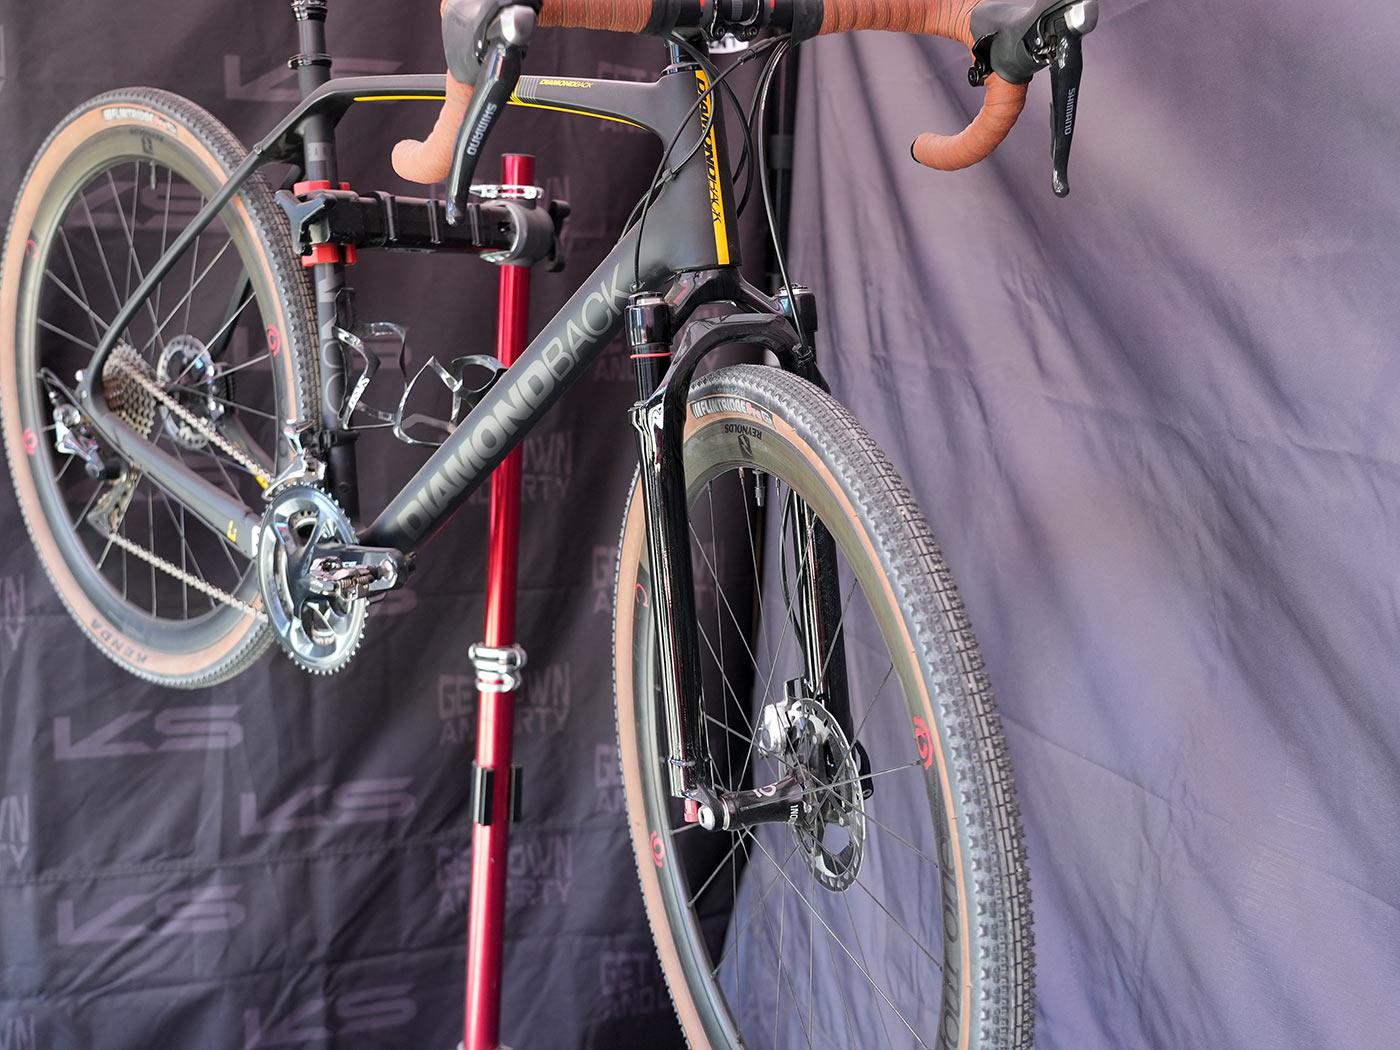 KS Rage iS suspension dropper seatpost & prototype carbon gravel suspension fork pop up thumbnail